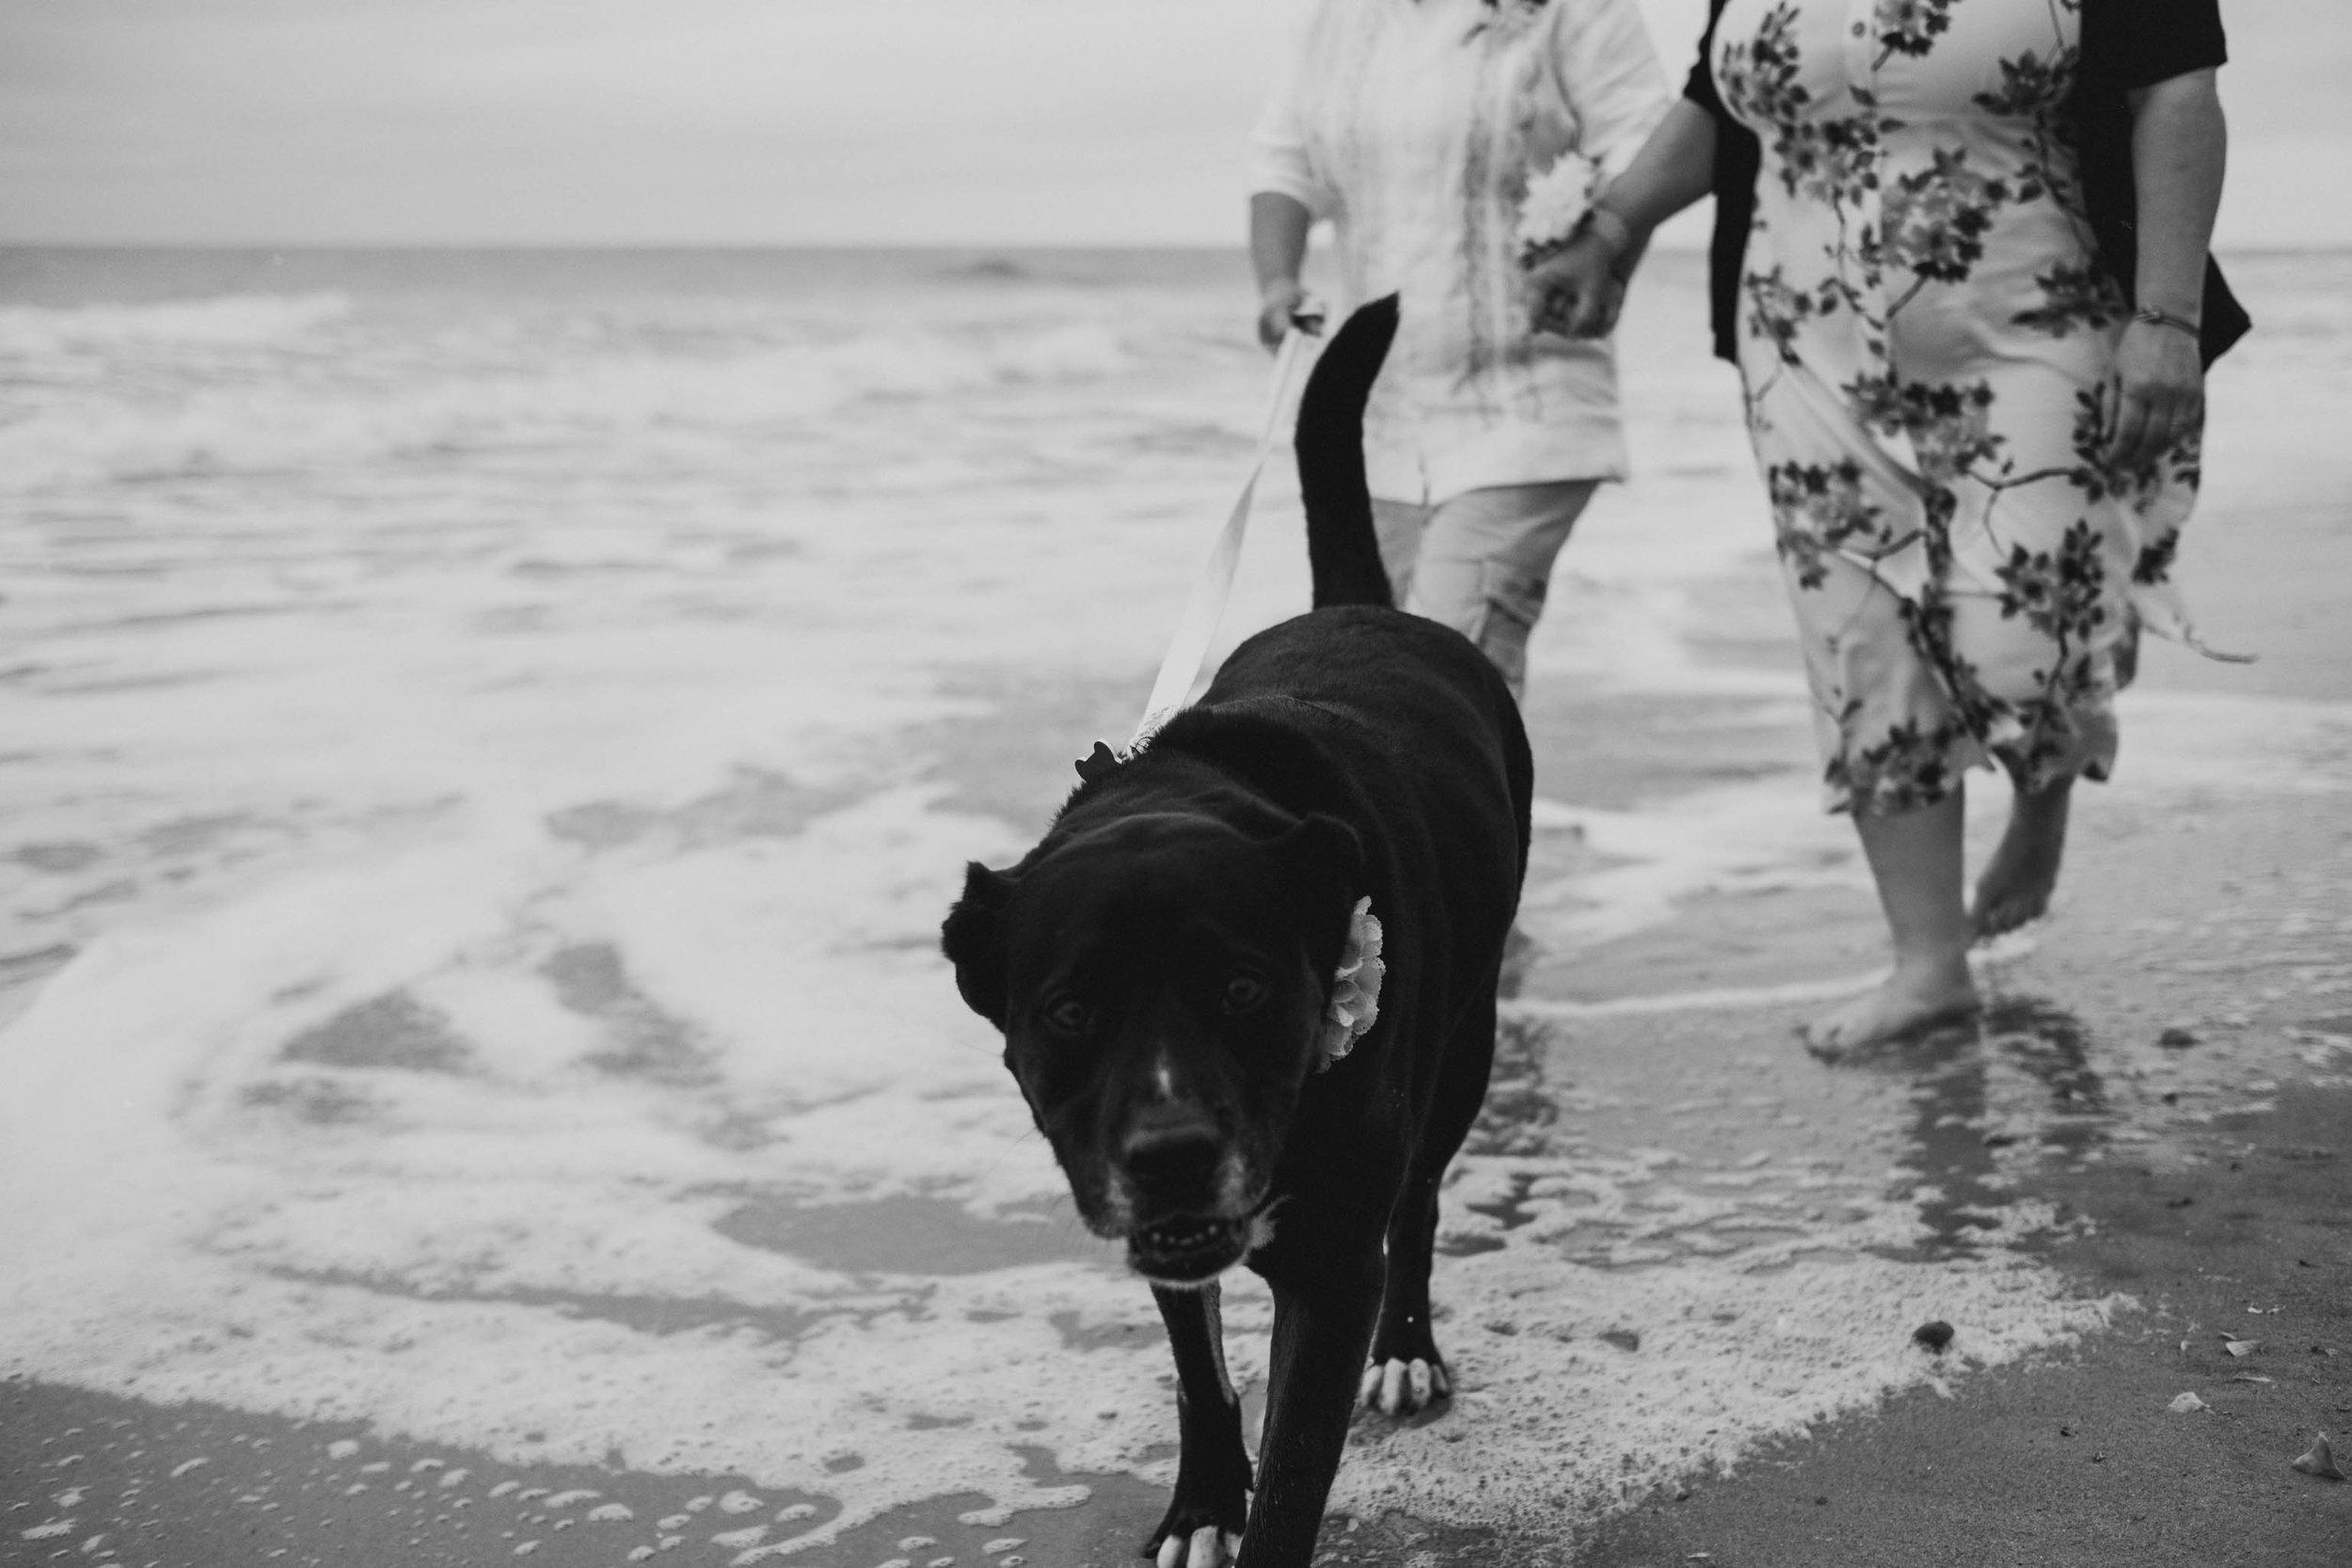 pet-friendly-topsail-island-same-sex-beach-wedding-photo.jpg